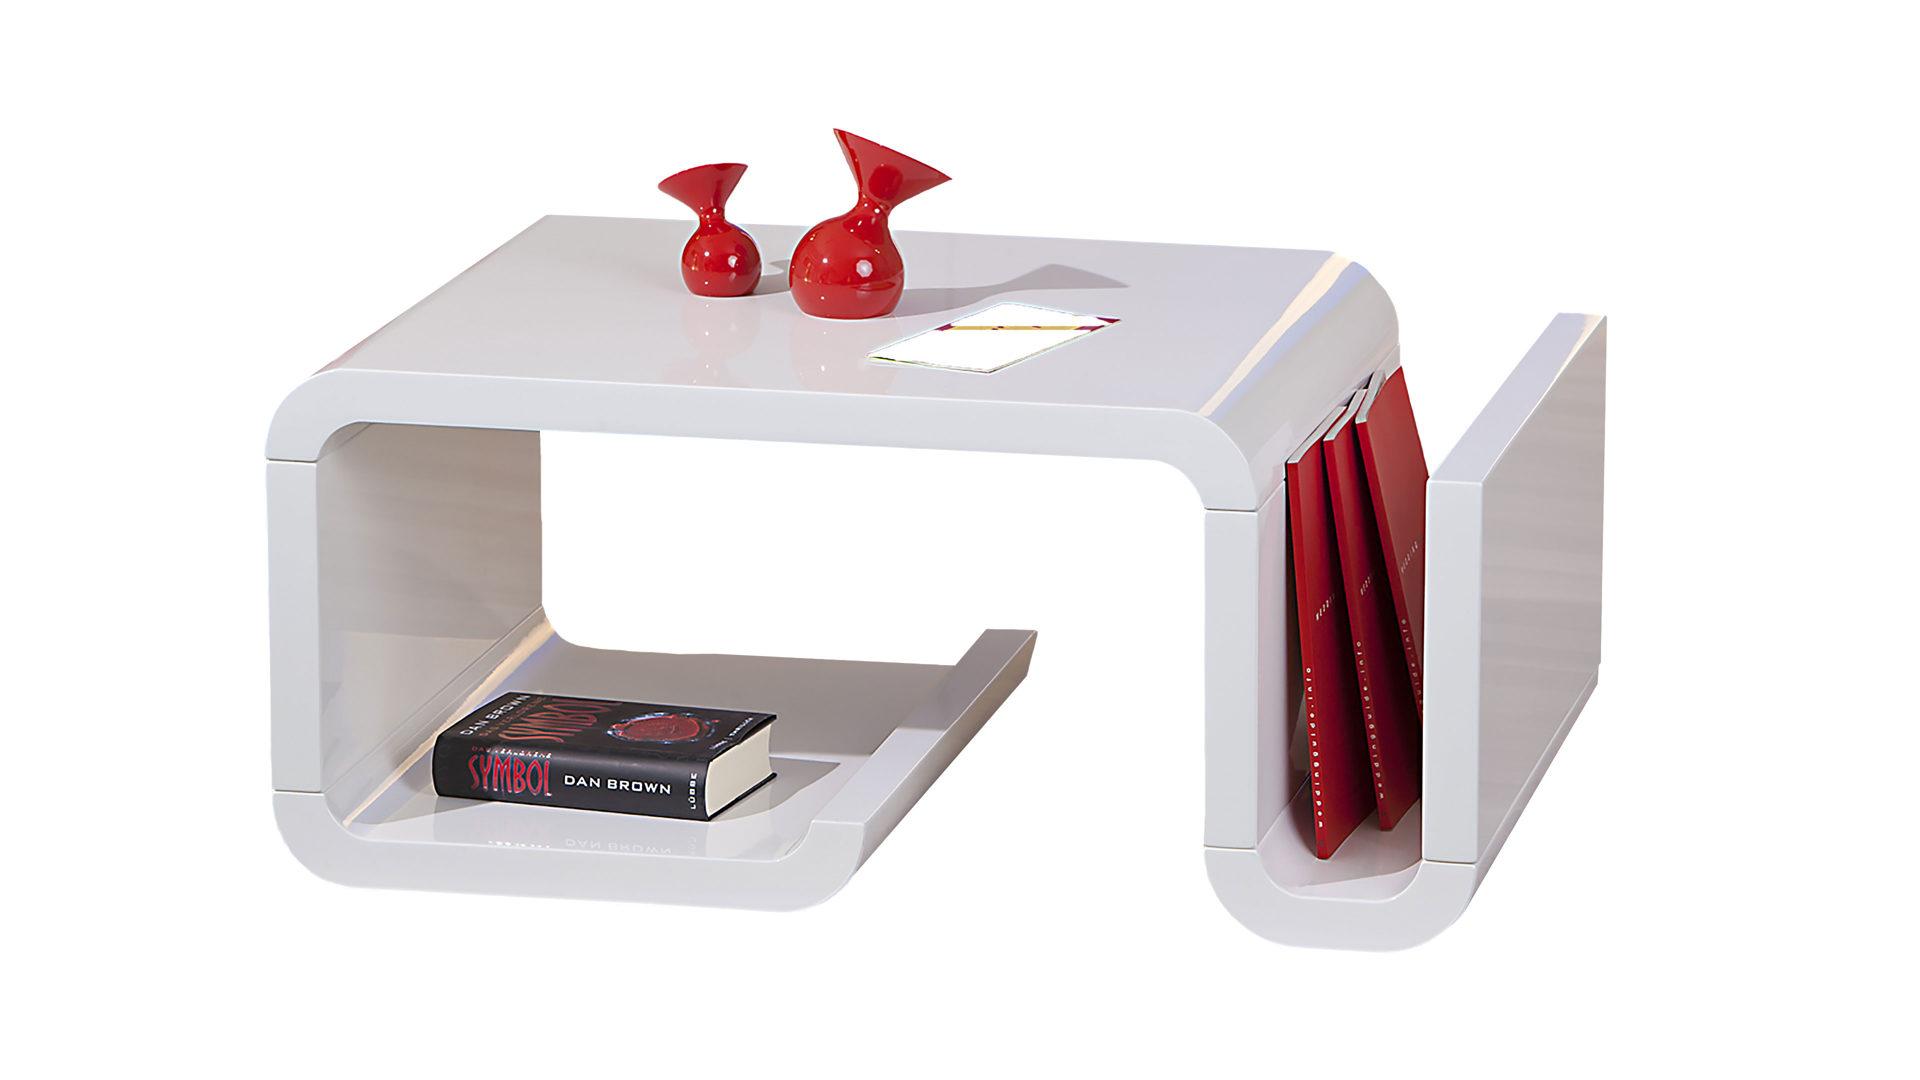 Möbel Hölzle Villingen Schwenningen Möbel A Z Tische Couchtische